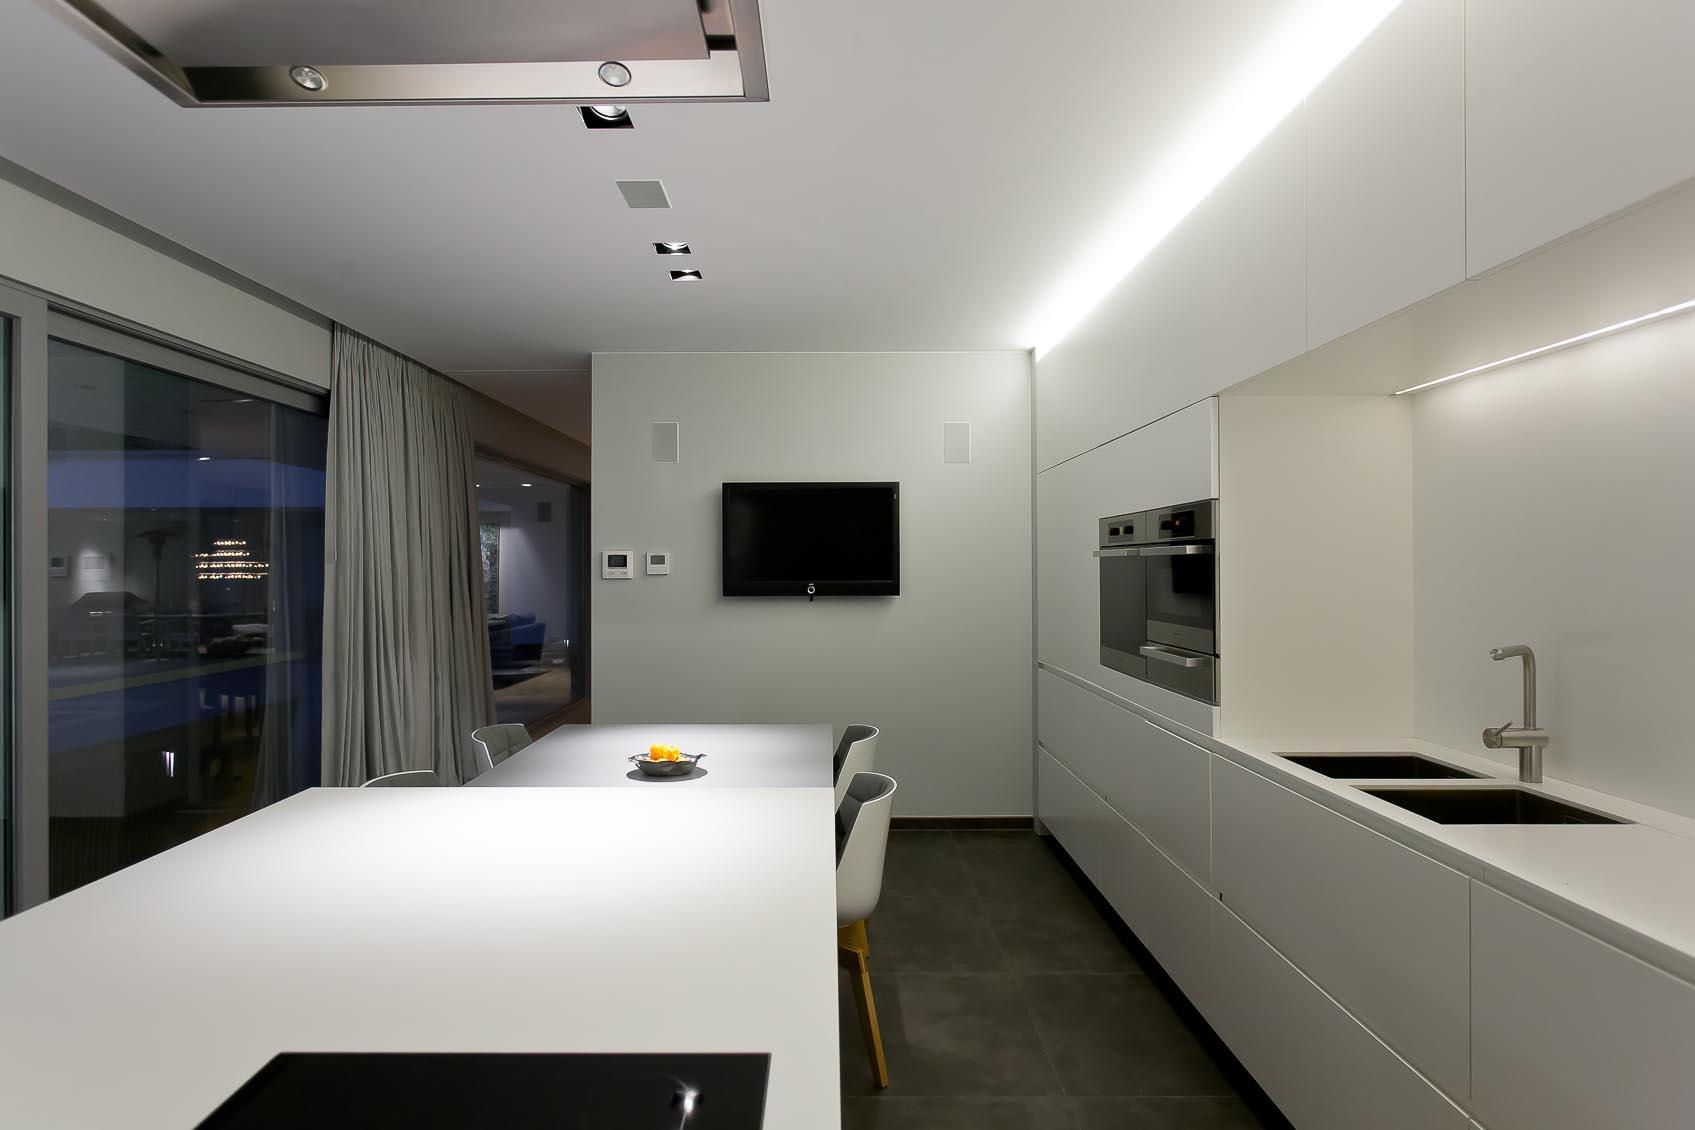 Inbouwspot Keuken : Keuken inbouwspots led spots keukens cf